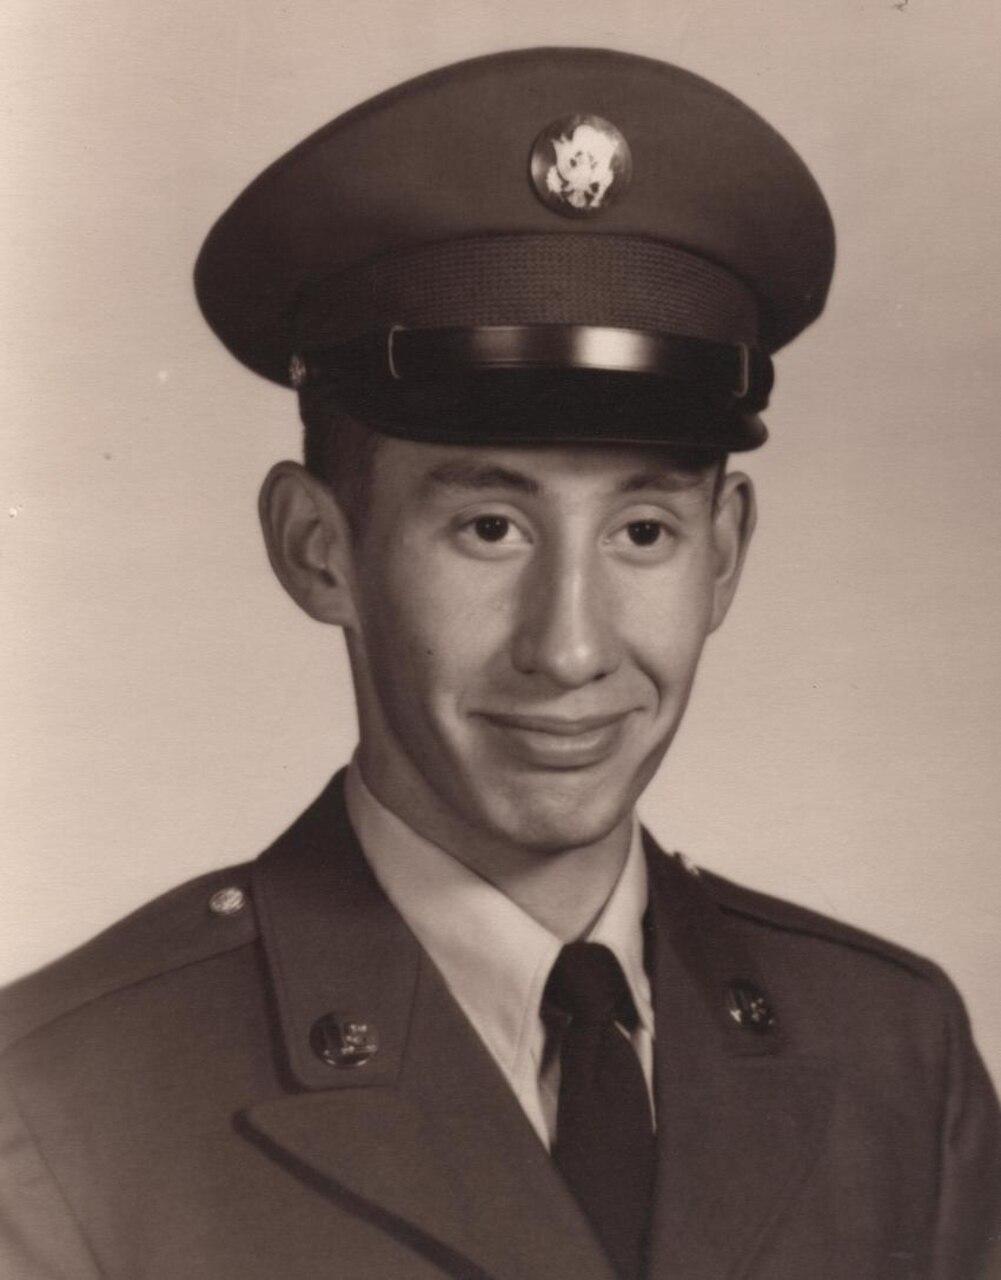 Official Army photo of Daniel Fernandez in uniform.